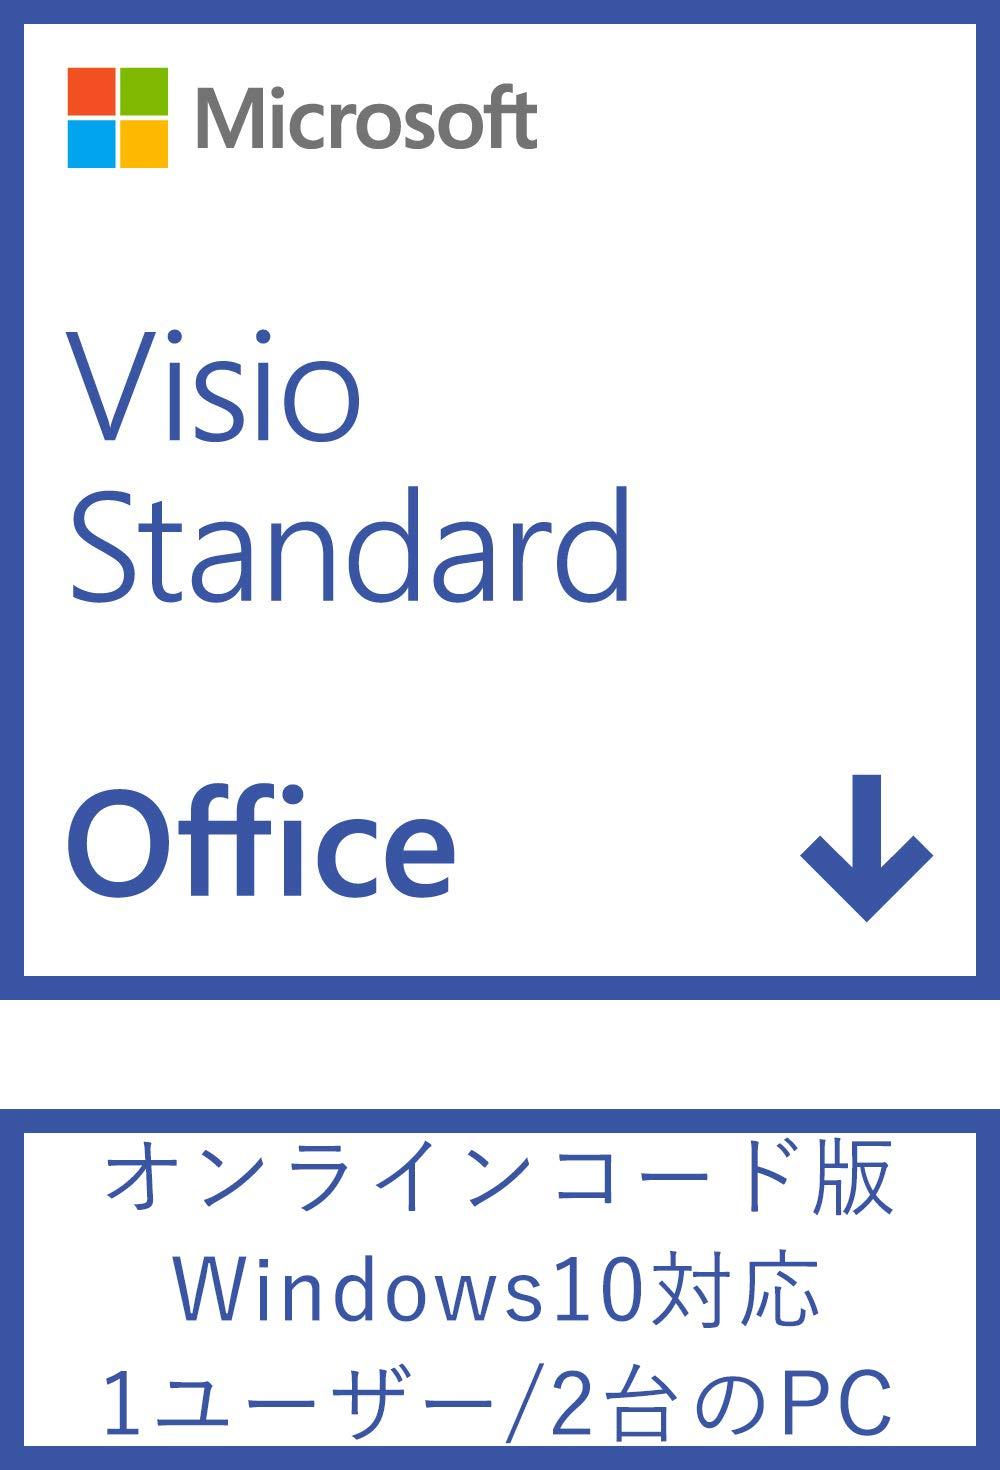 Visio Standard 2019